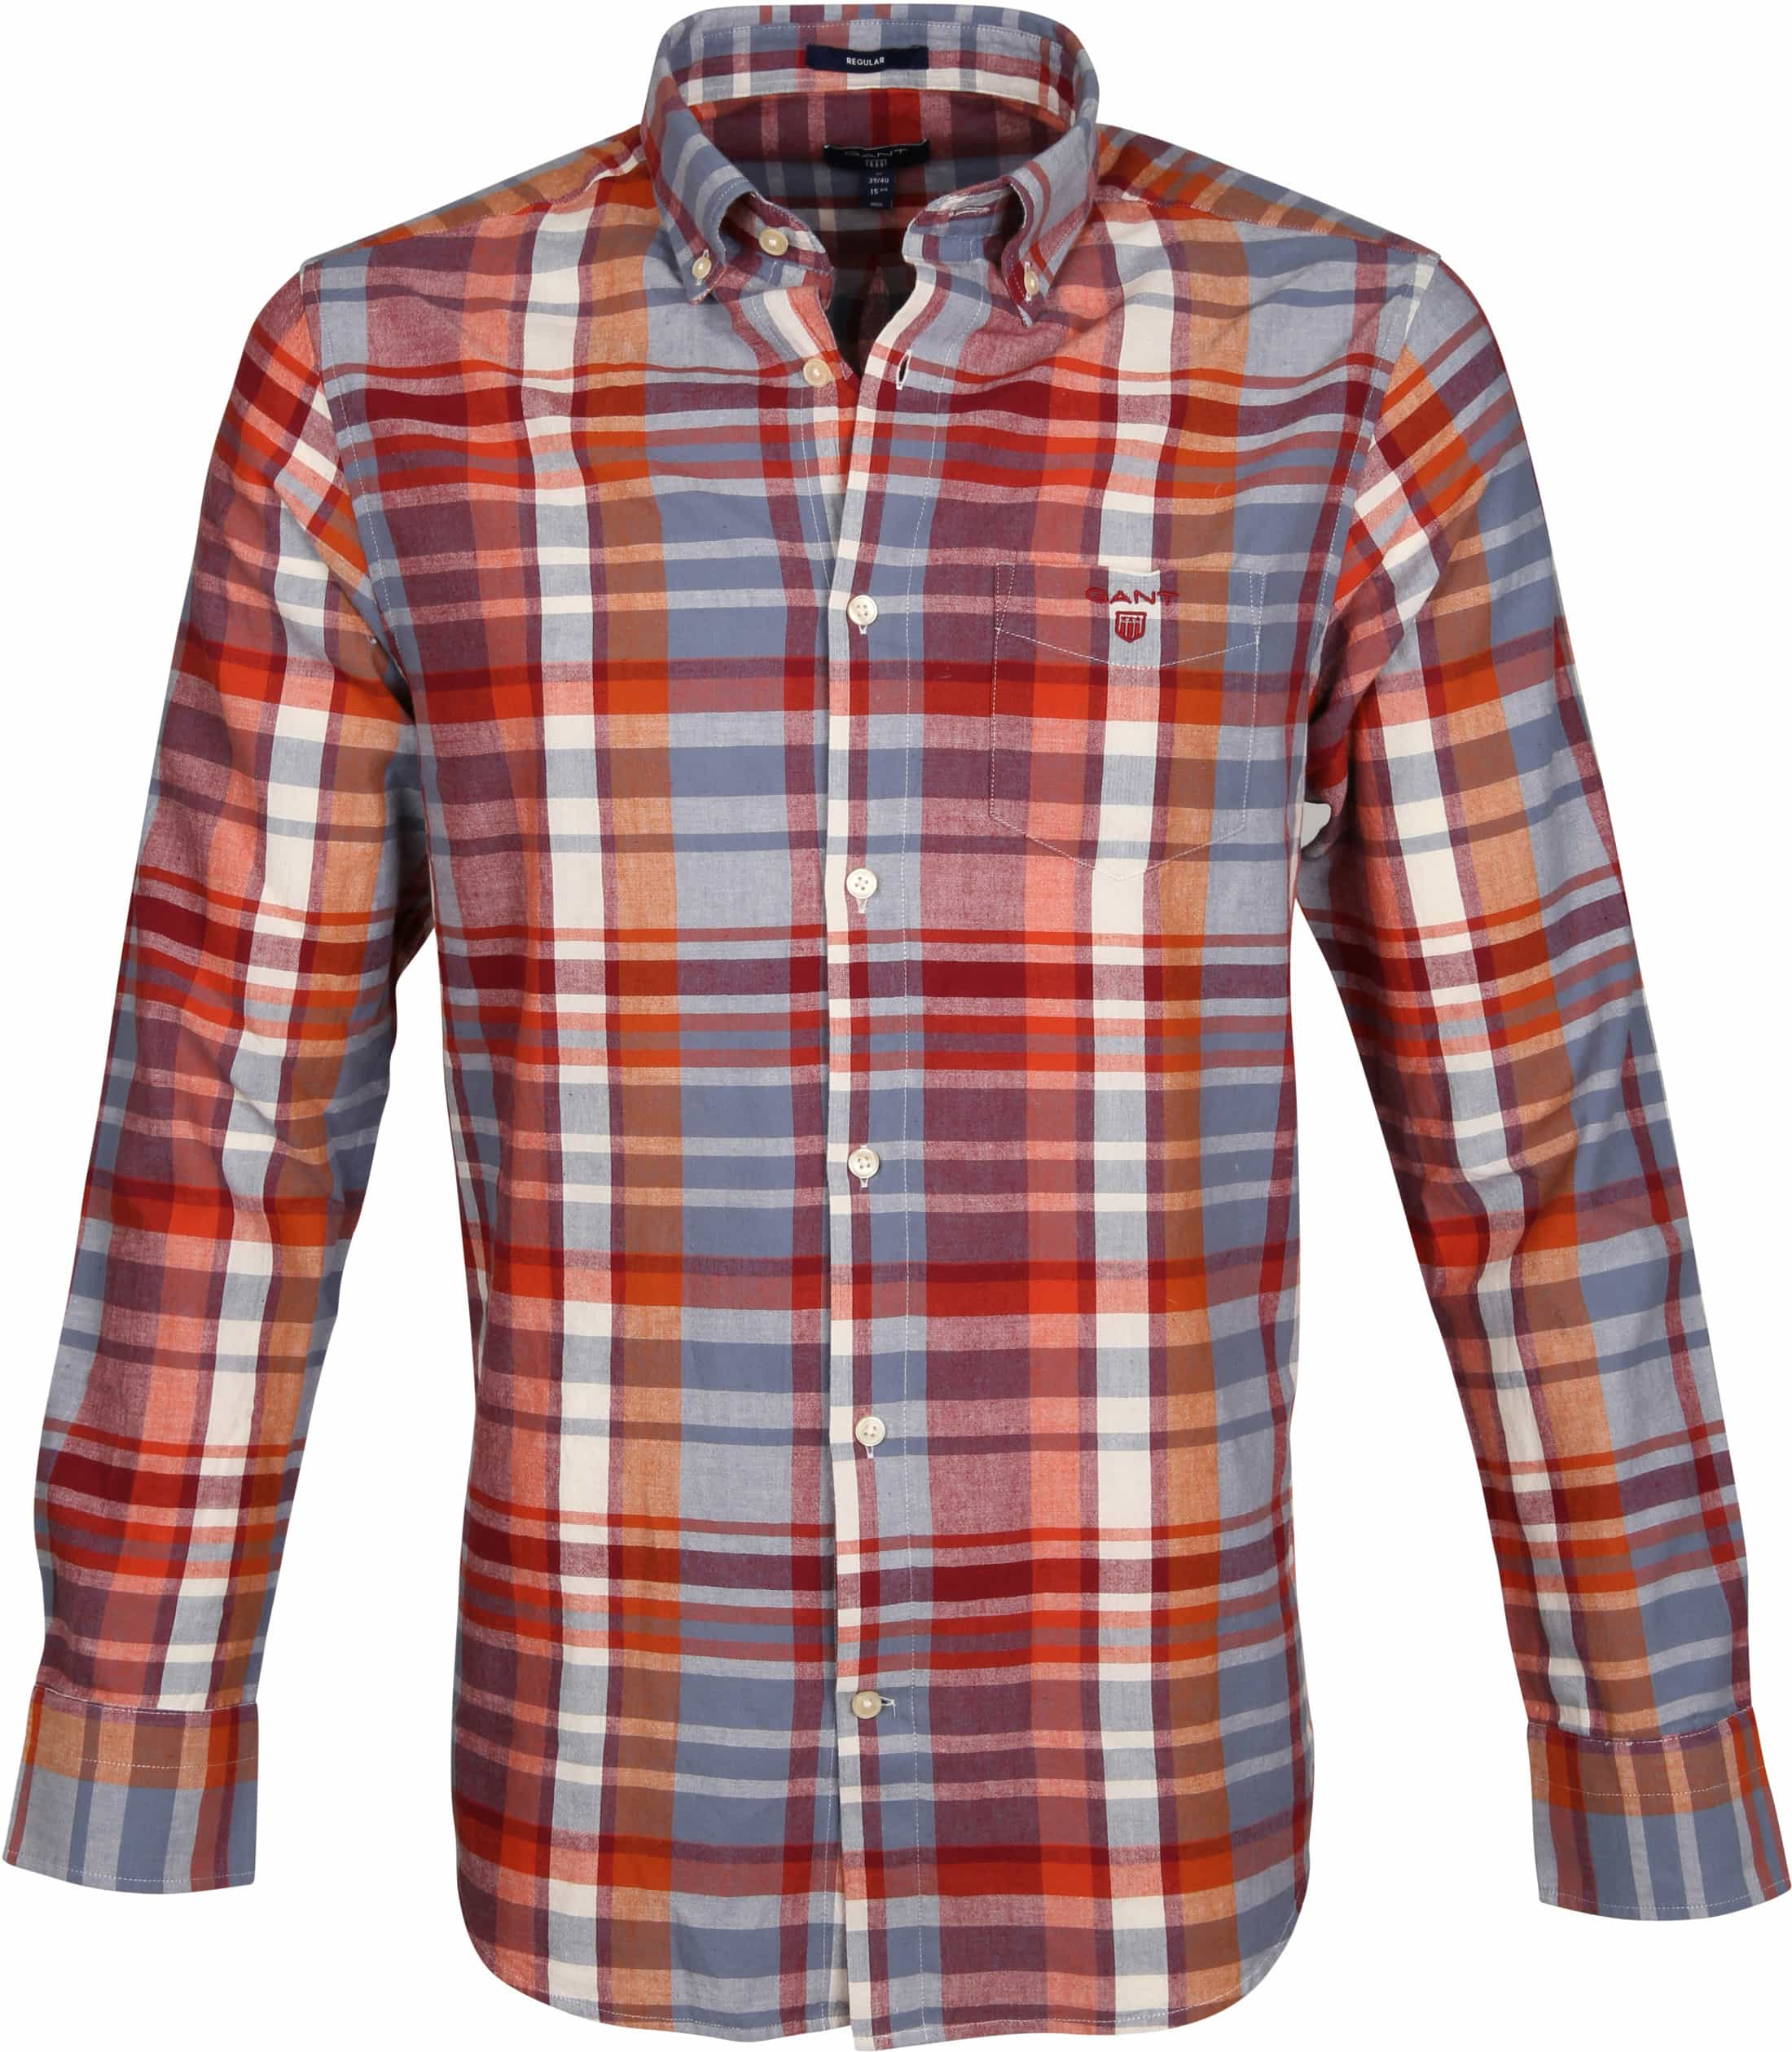 Gant Overhemd Madras Rood foto 0